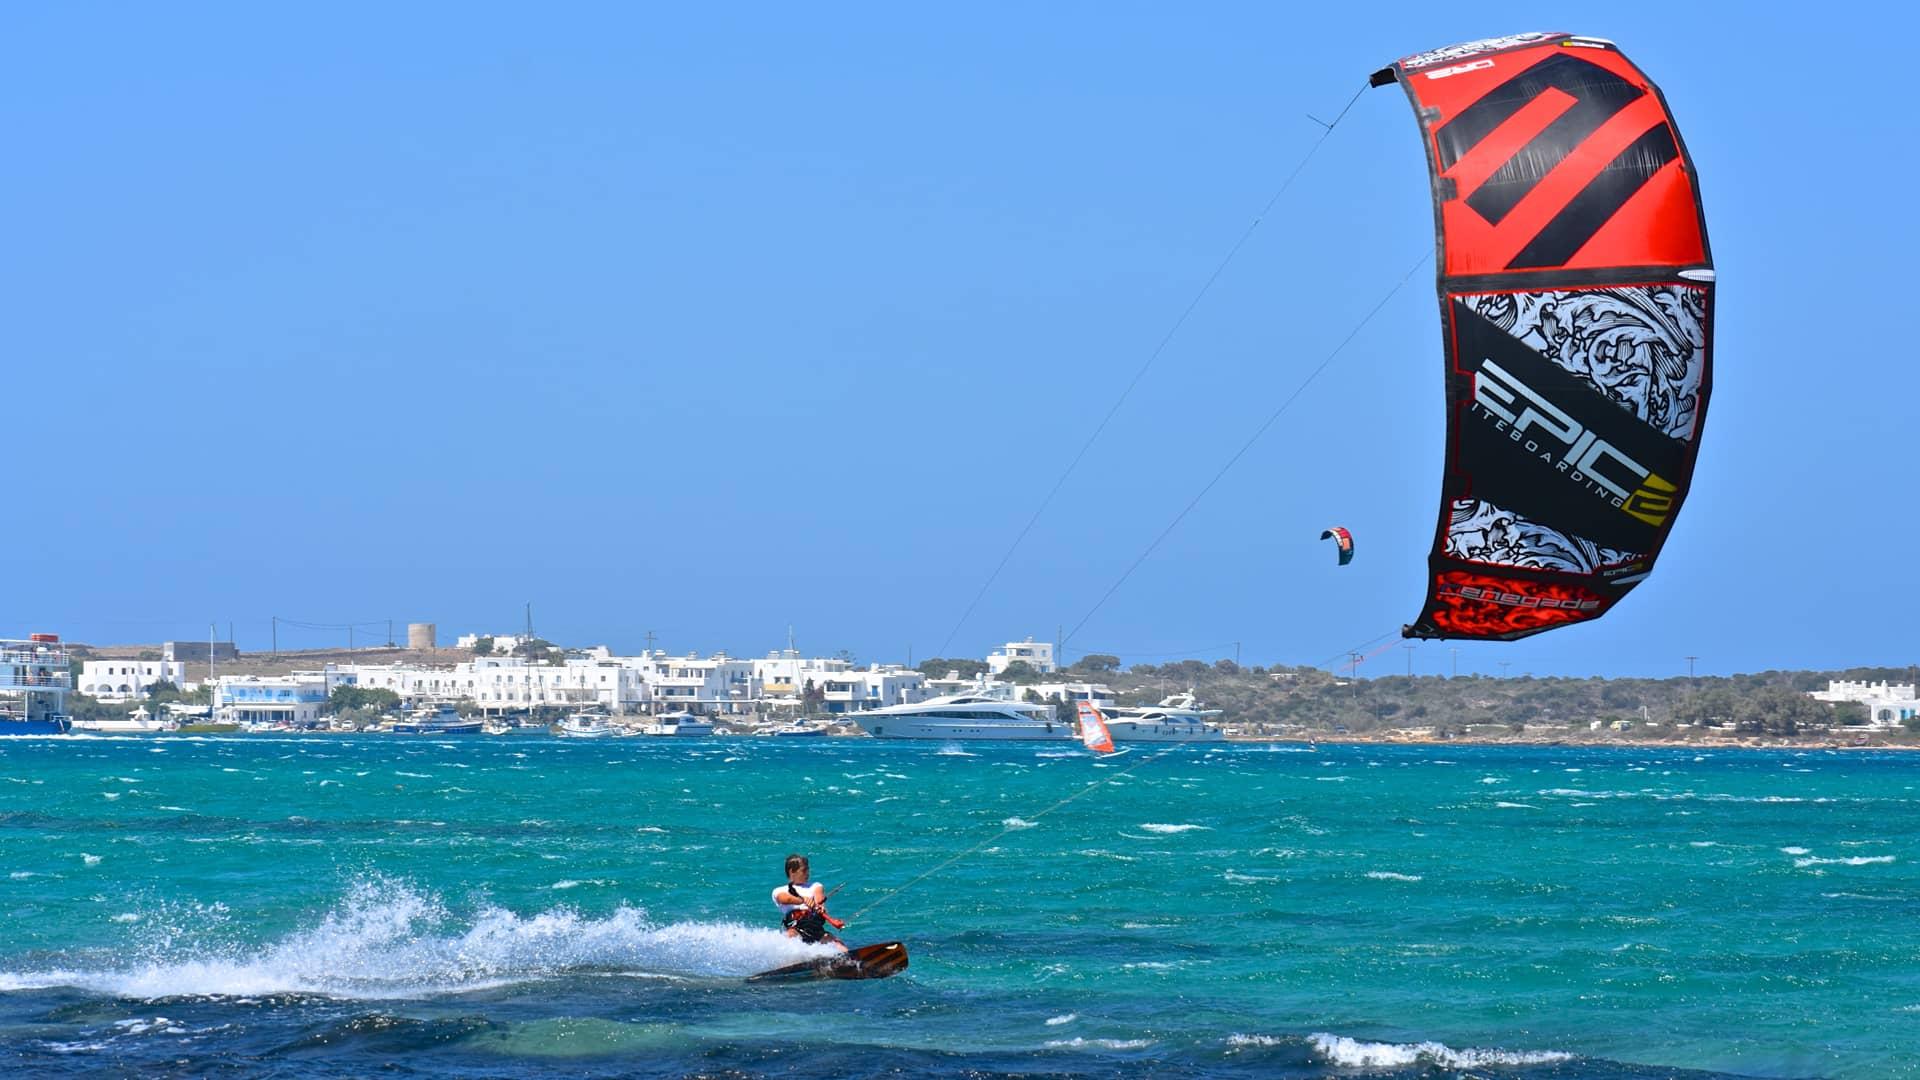 Kiteboarding Project X - with Epic Kites Kiteboarding